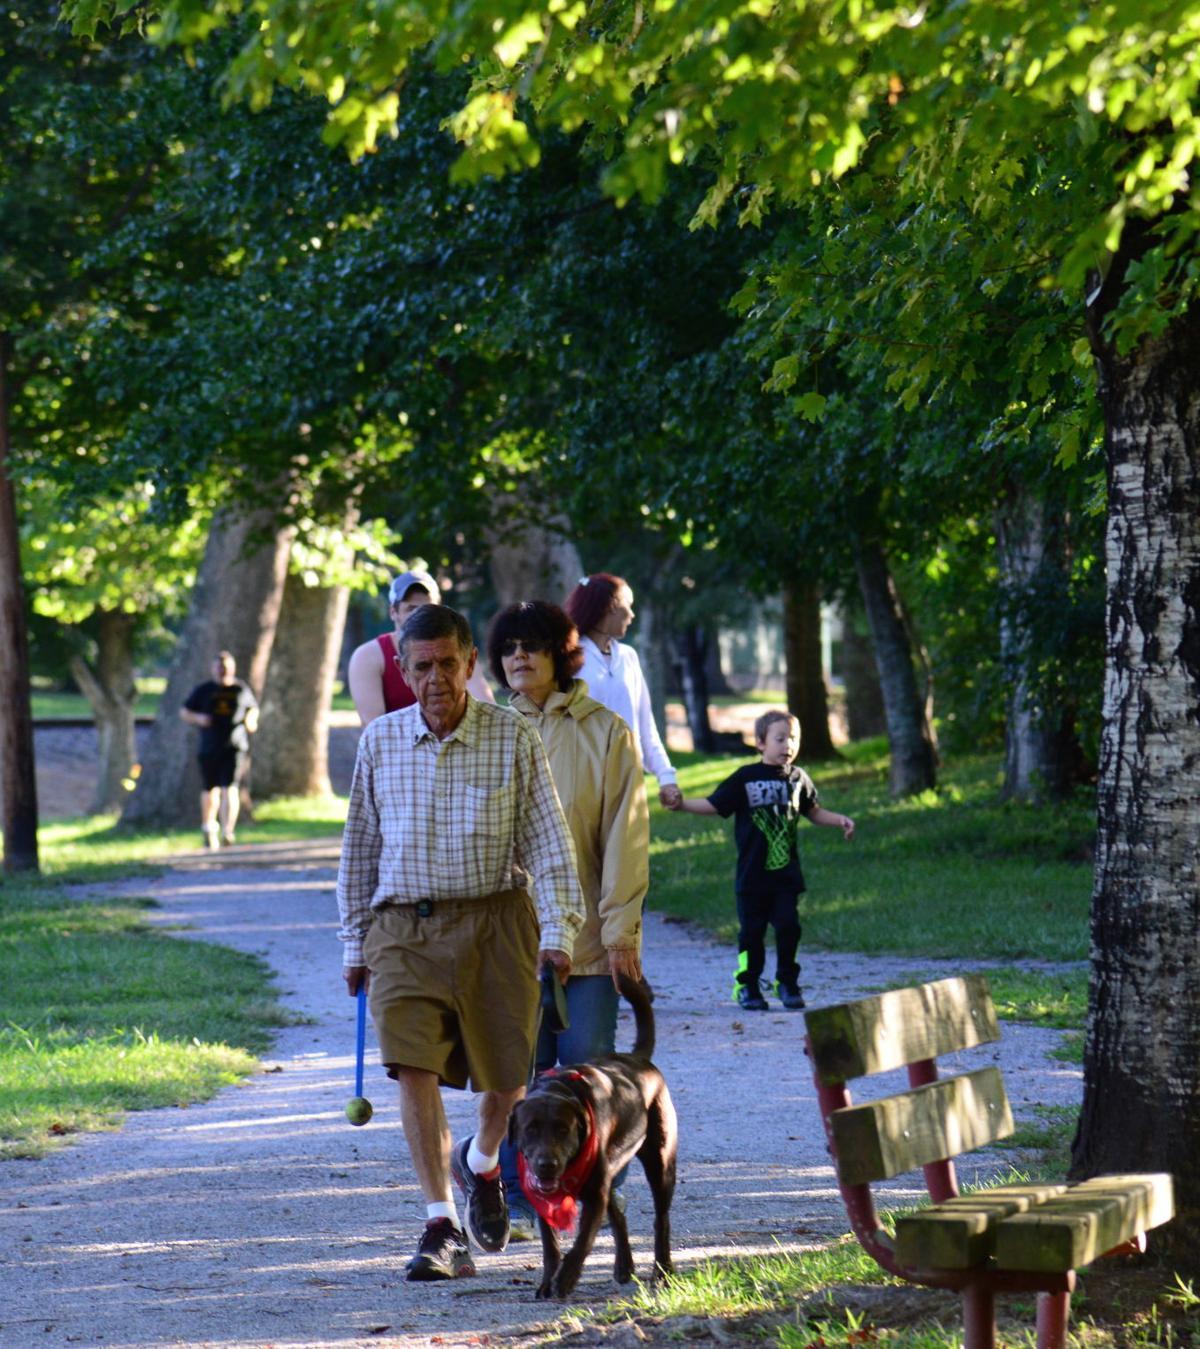 waynesville greenway walkers 1.JPG